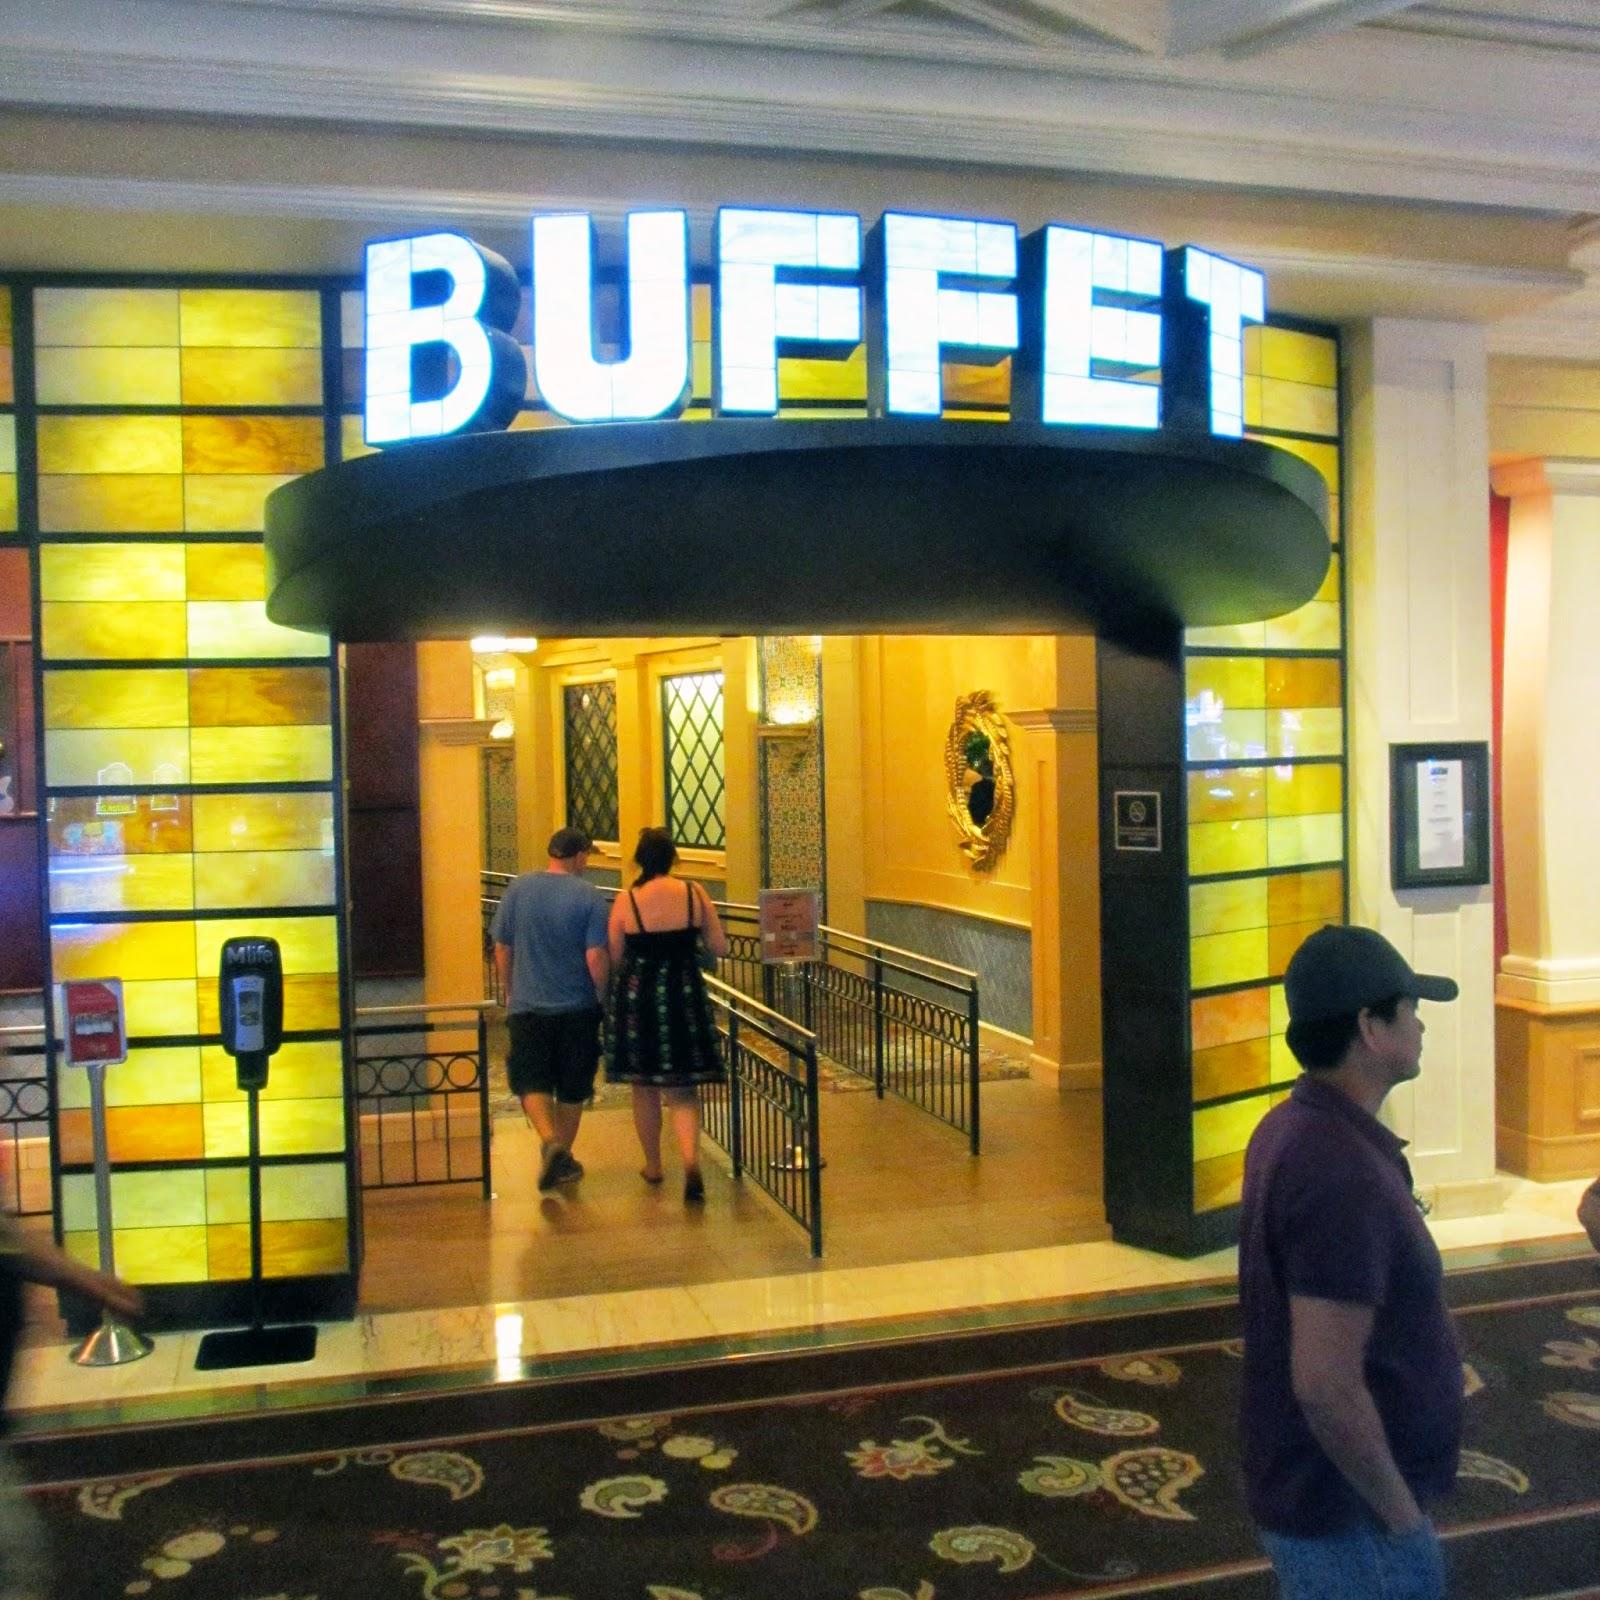 Florida Burger Lover: The Buffet at the Bellagio - Las Vegas